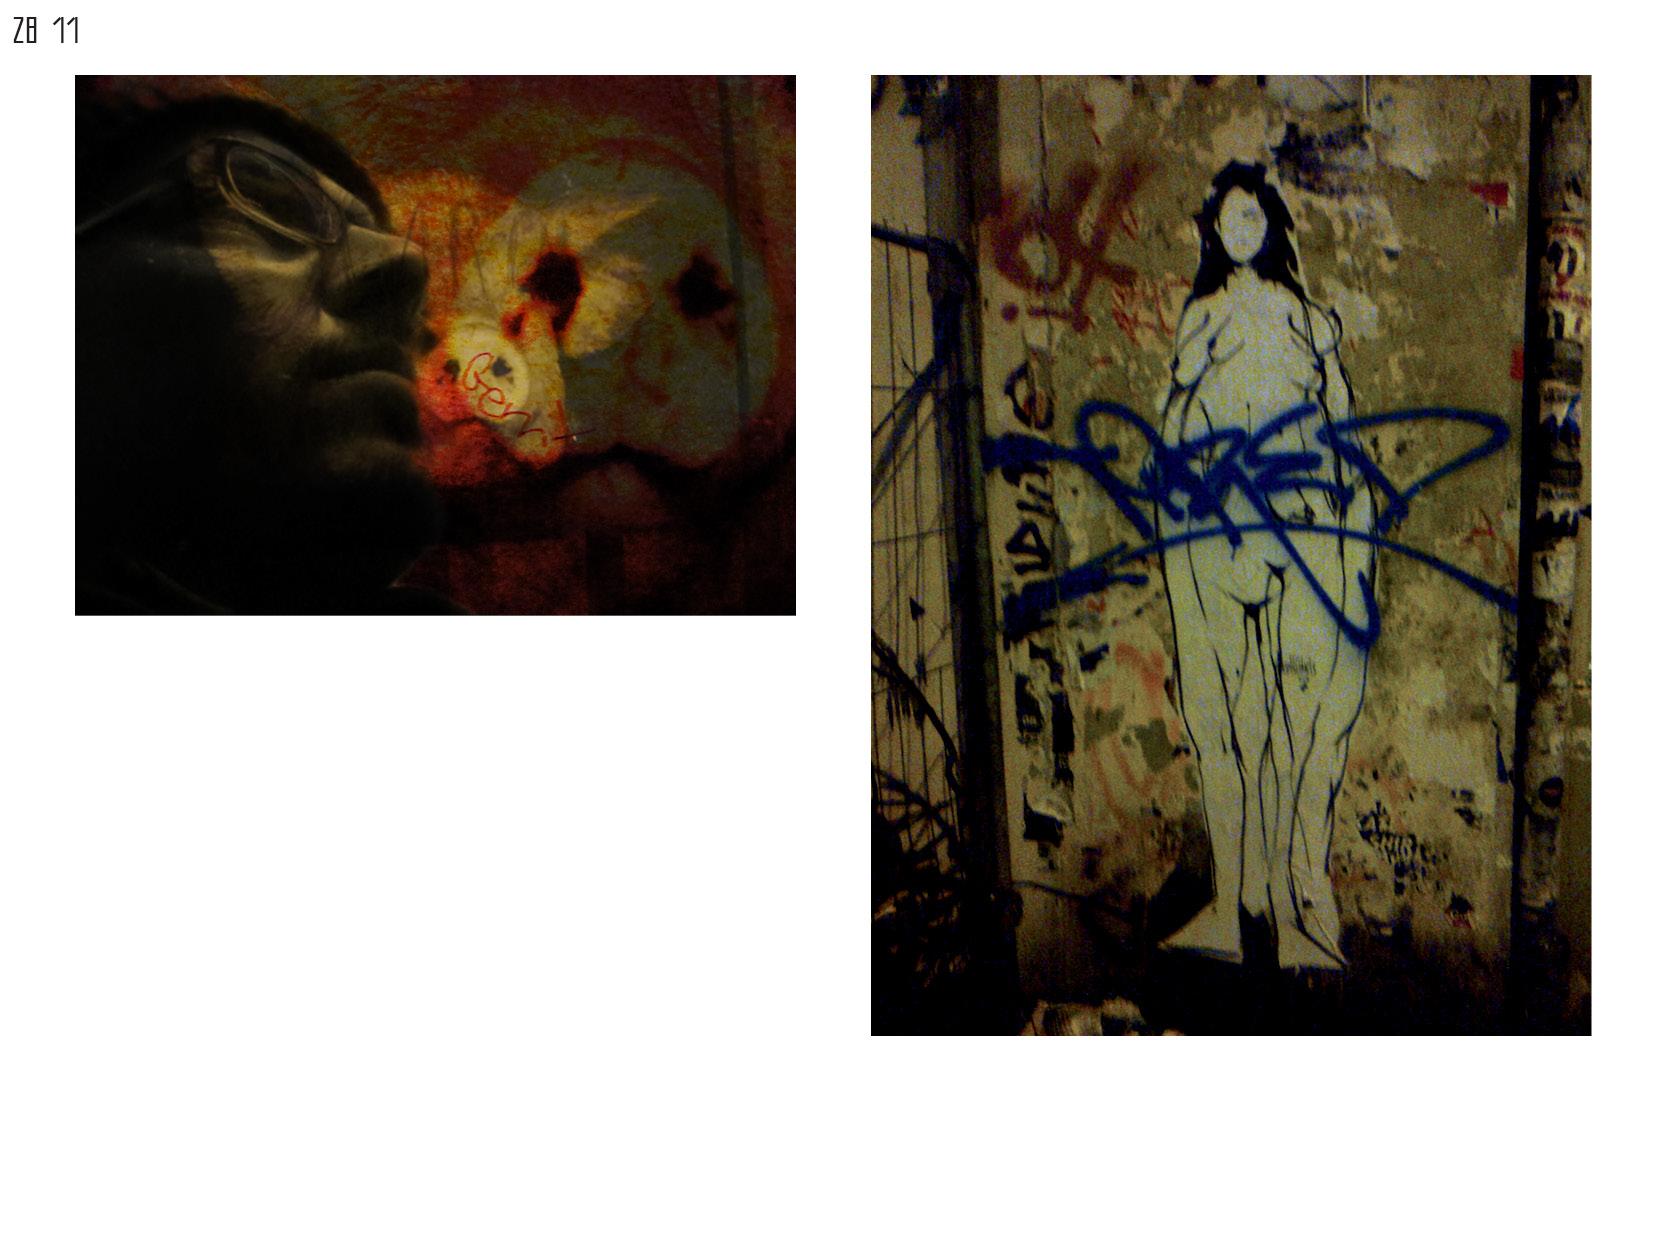 Gerrit-Schweiger-Dialog-Städte-Paris-Berlin-Jessica-Blank-Experiment-Fotoserie-Tagebuch-visuelle-Kommunikation-43